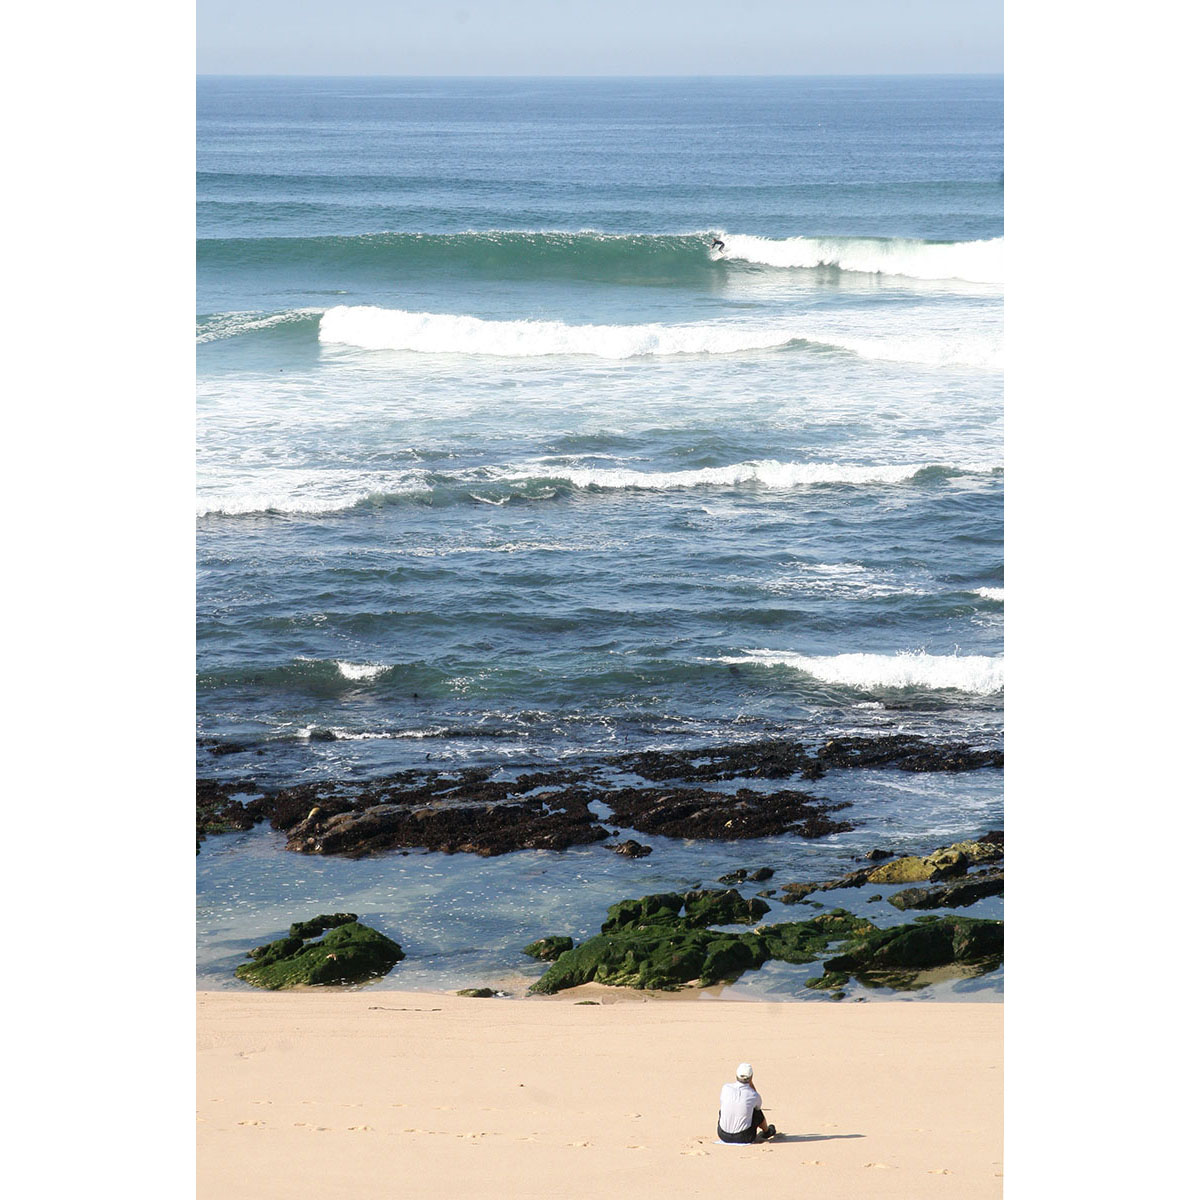 Northern Portugal secret spot